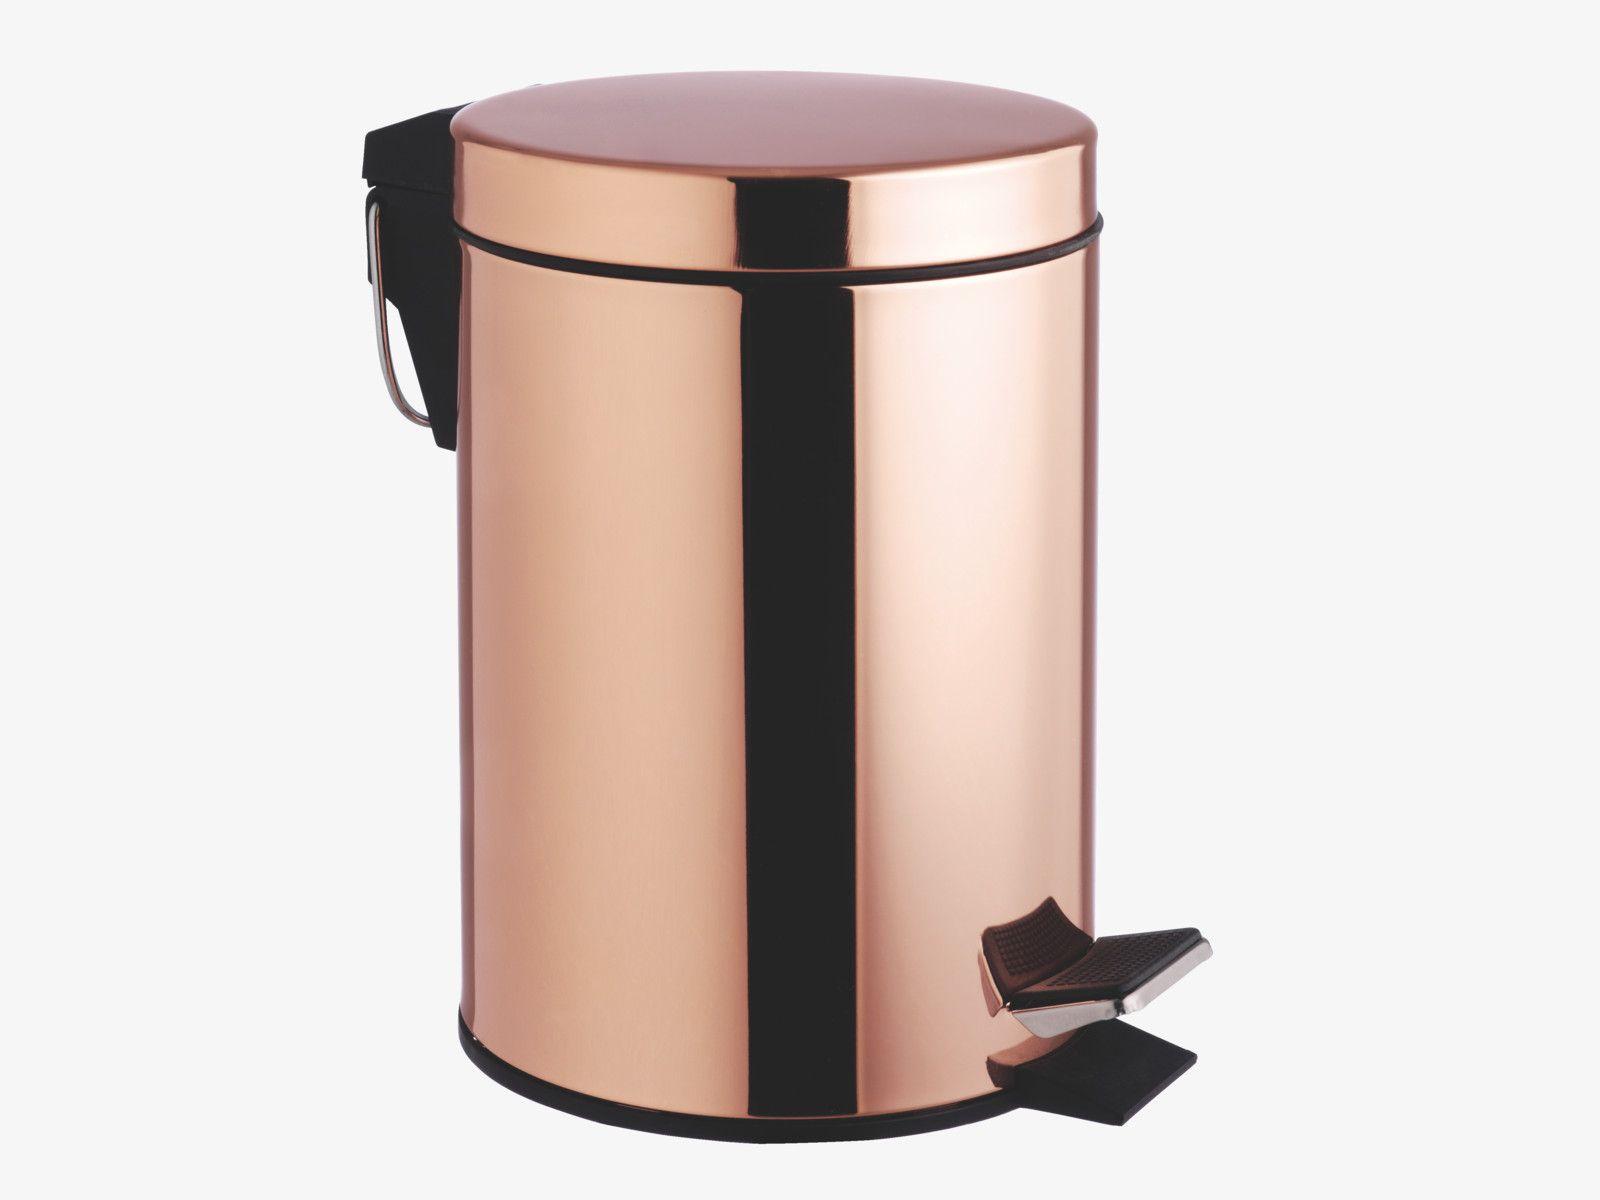 collier metallic metal copper metal peddle bathroom bin